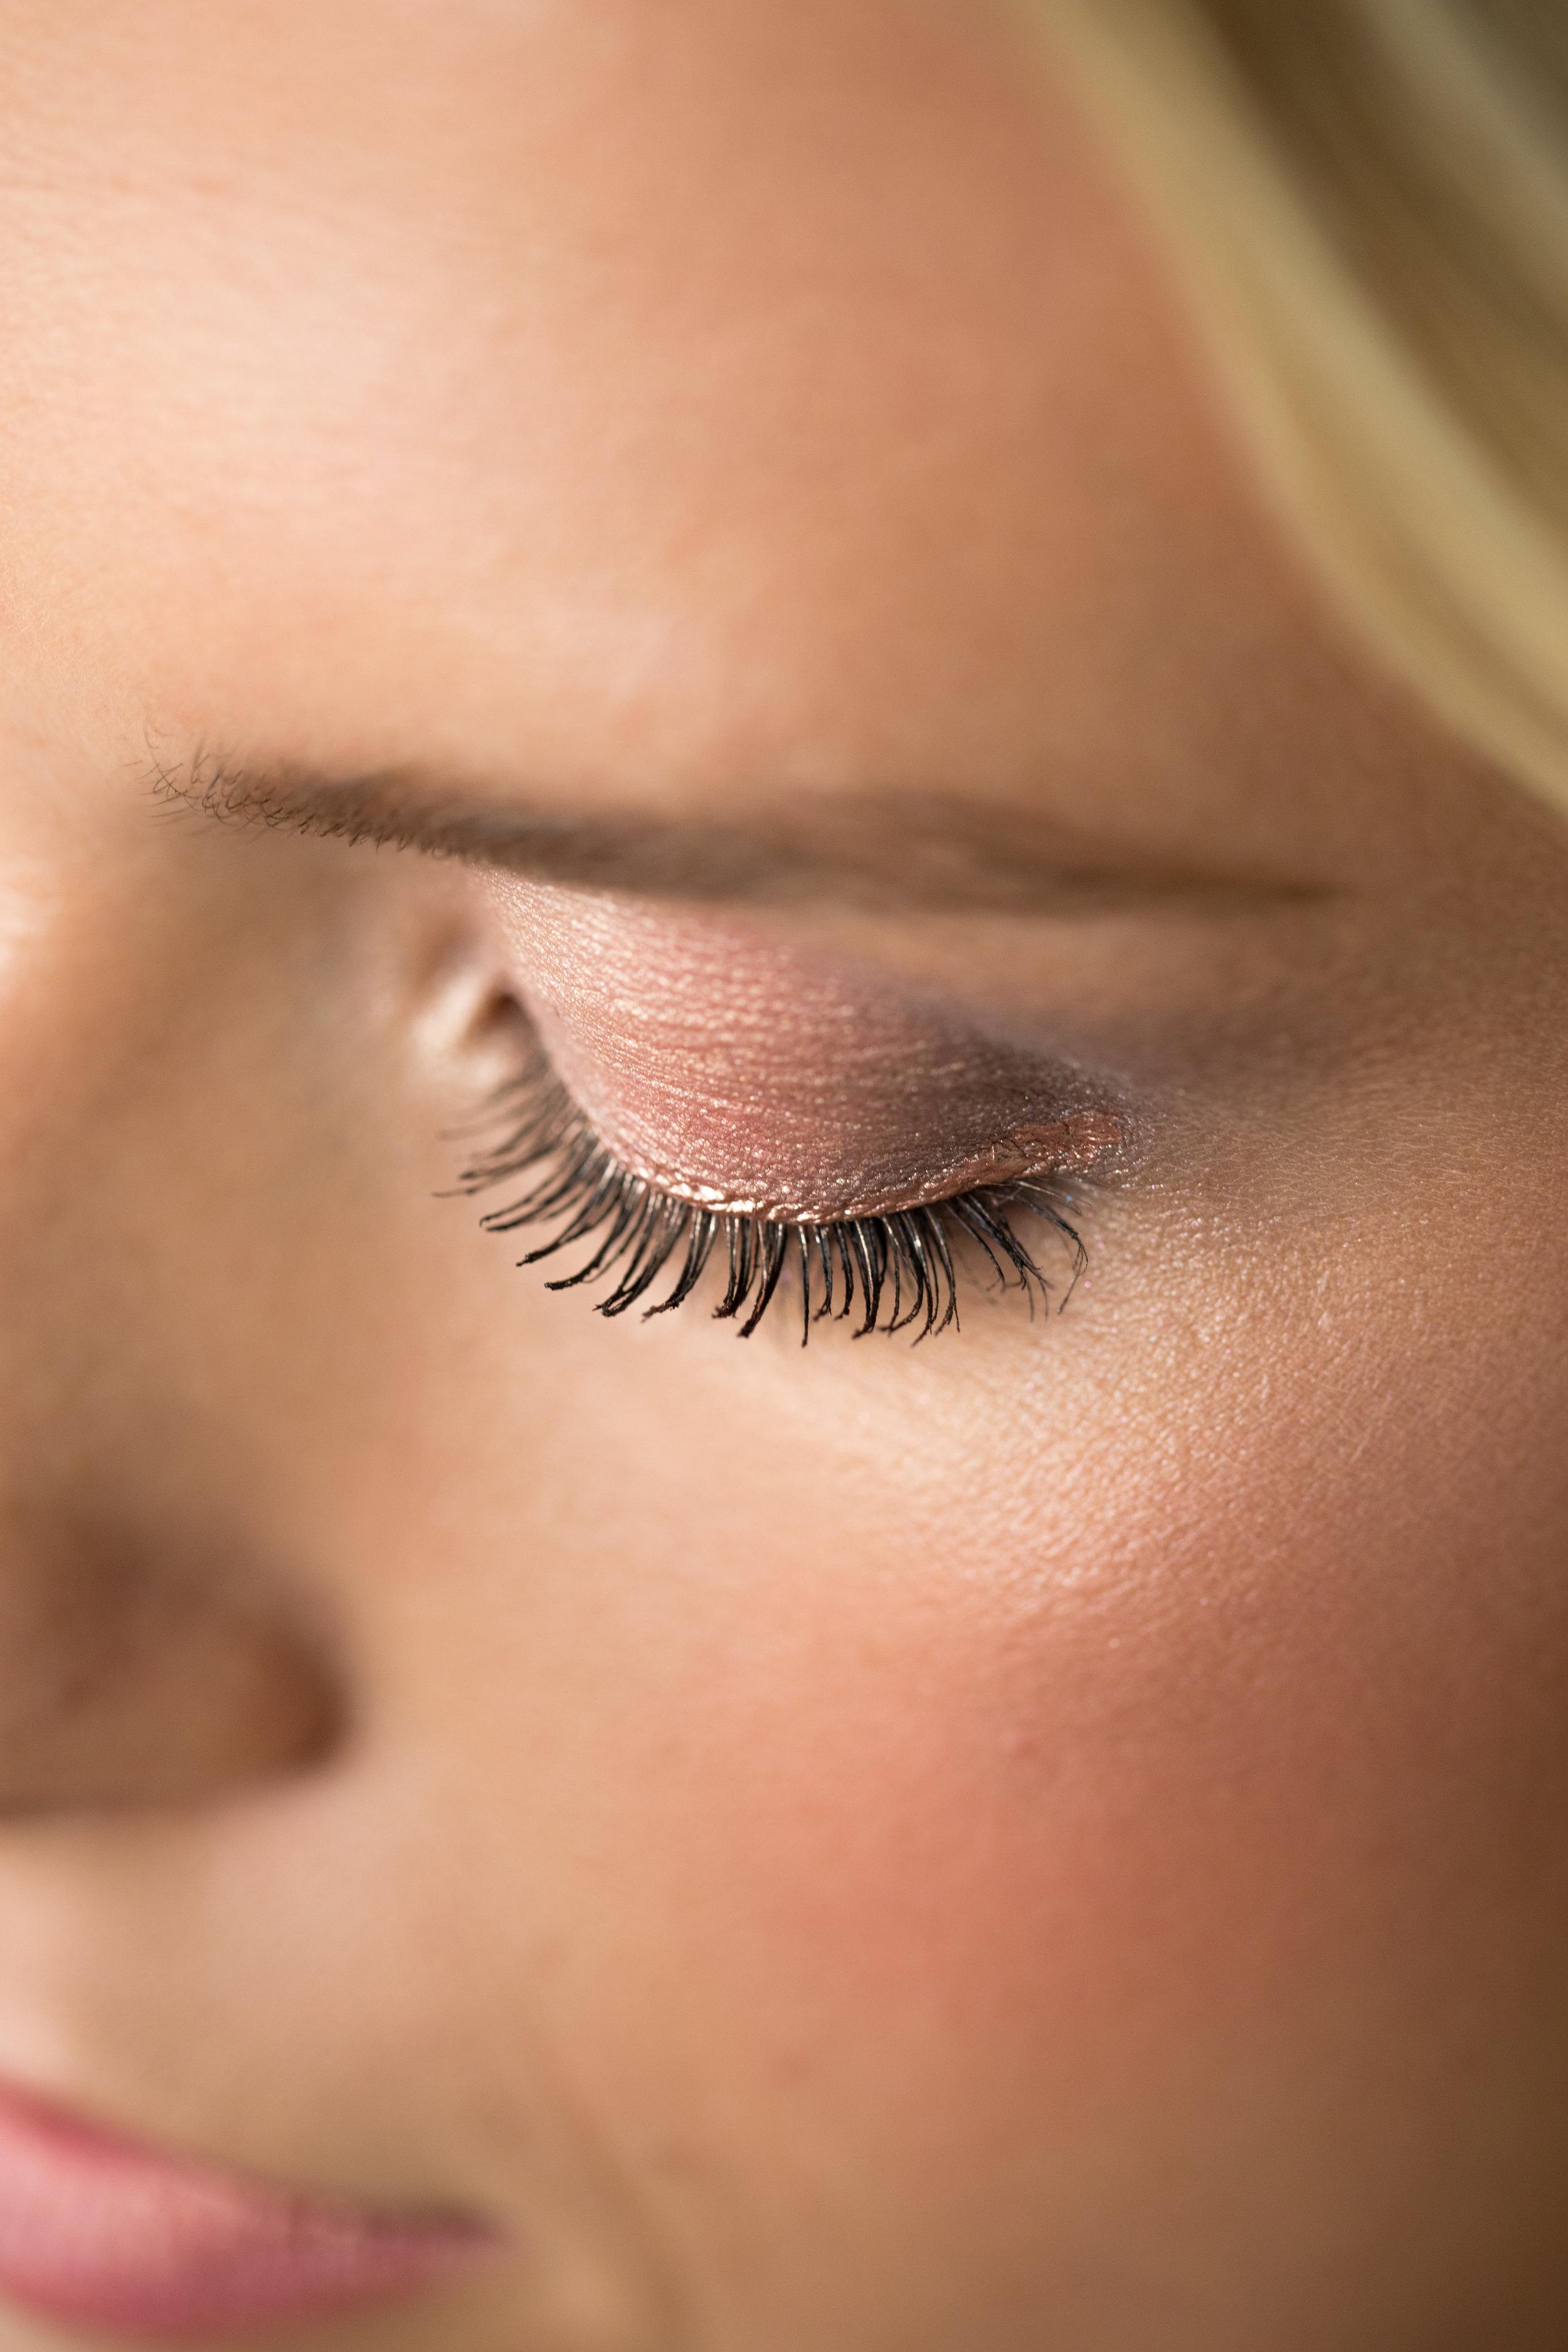 snackface-beauty-brunch-unicorn-eyeliner.jpg